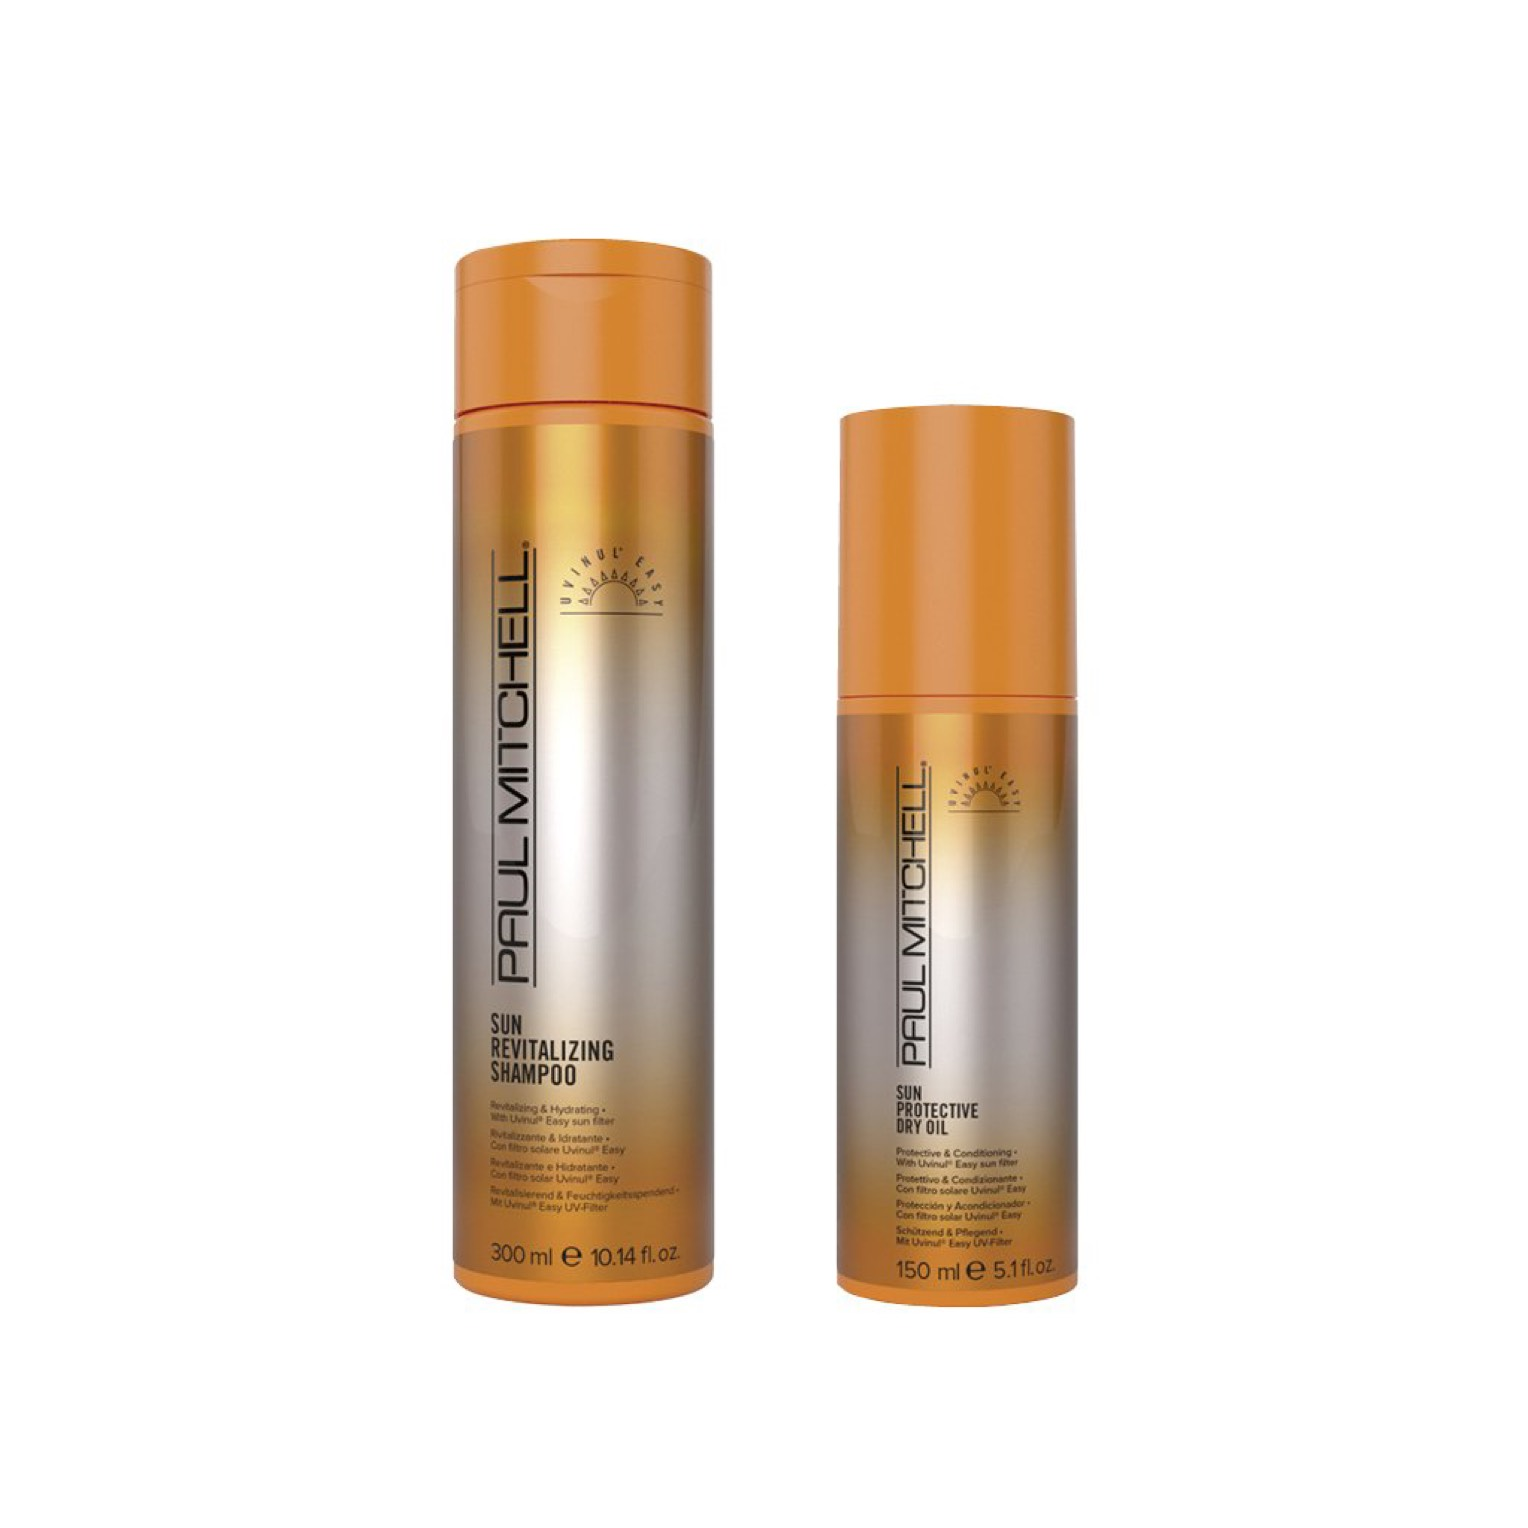 Paul Mitchell Sun Revitalizing Shampoo 250ml + Sun Protective Dry Oil 150ml